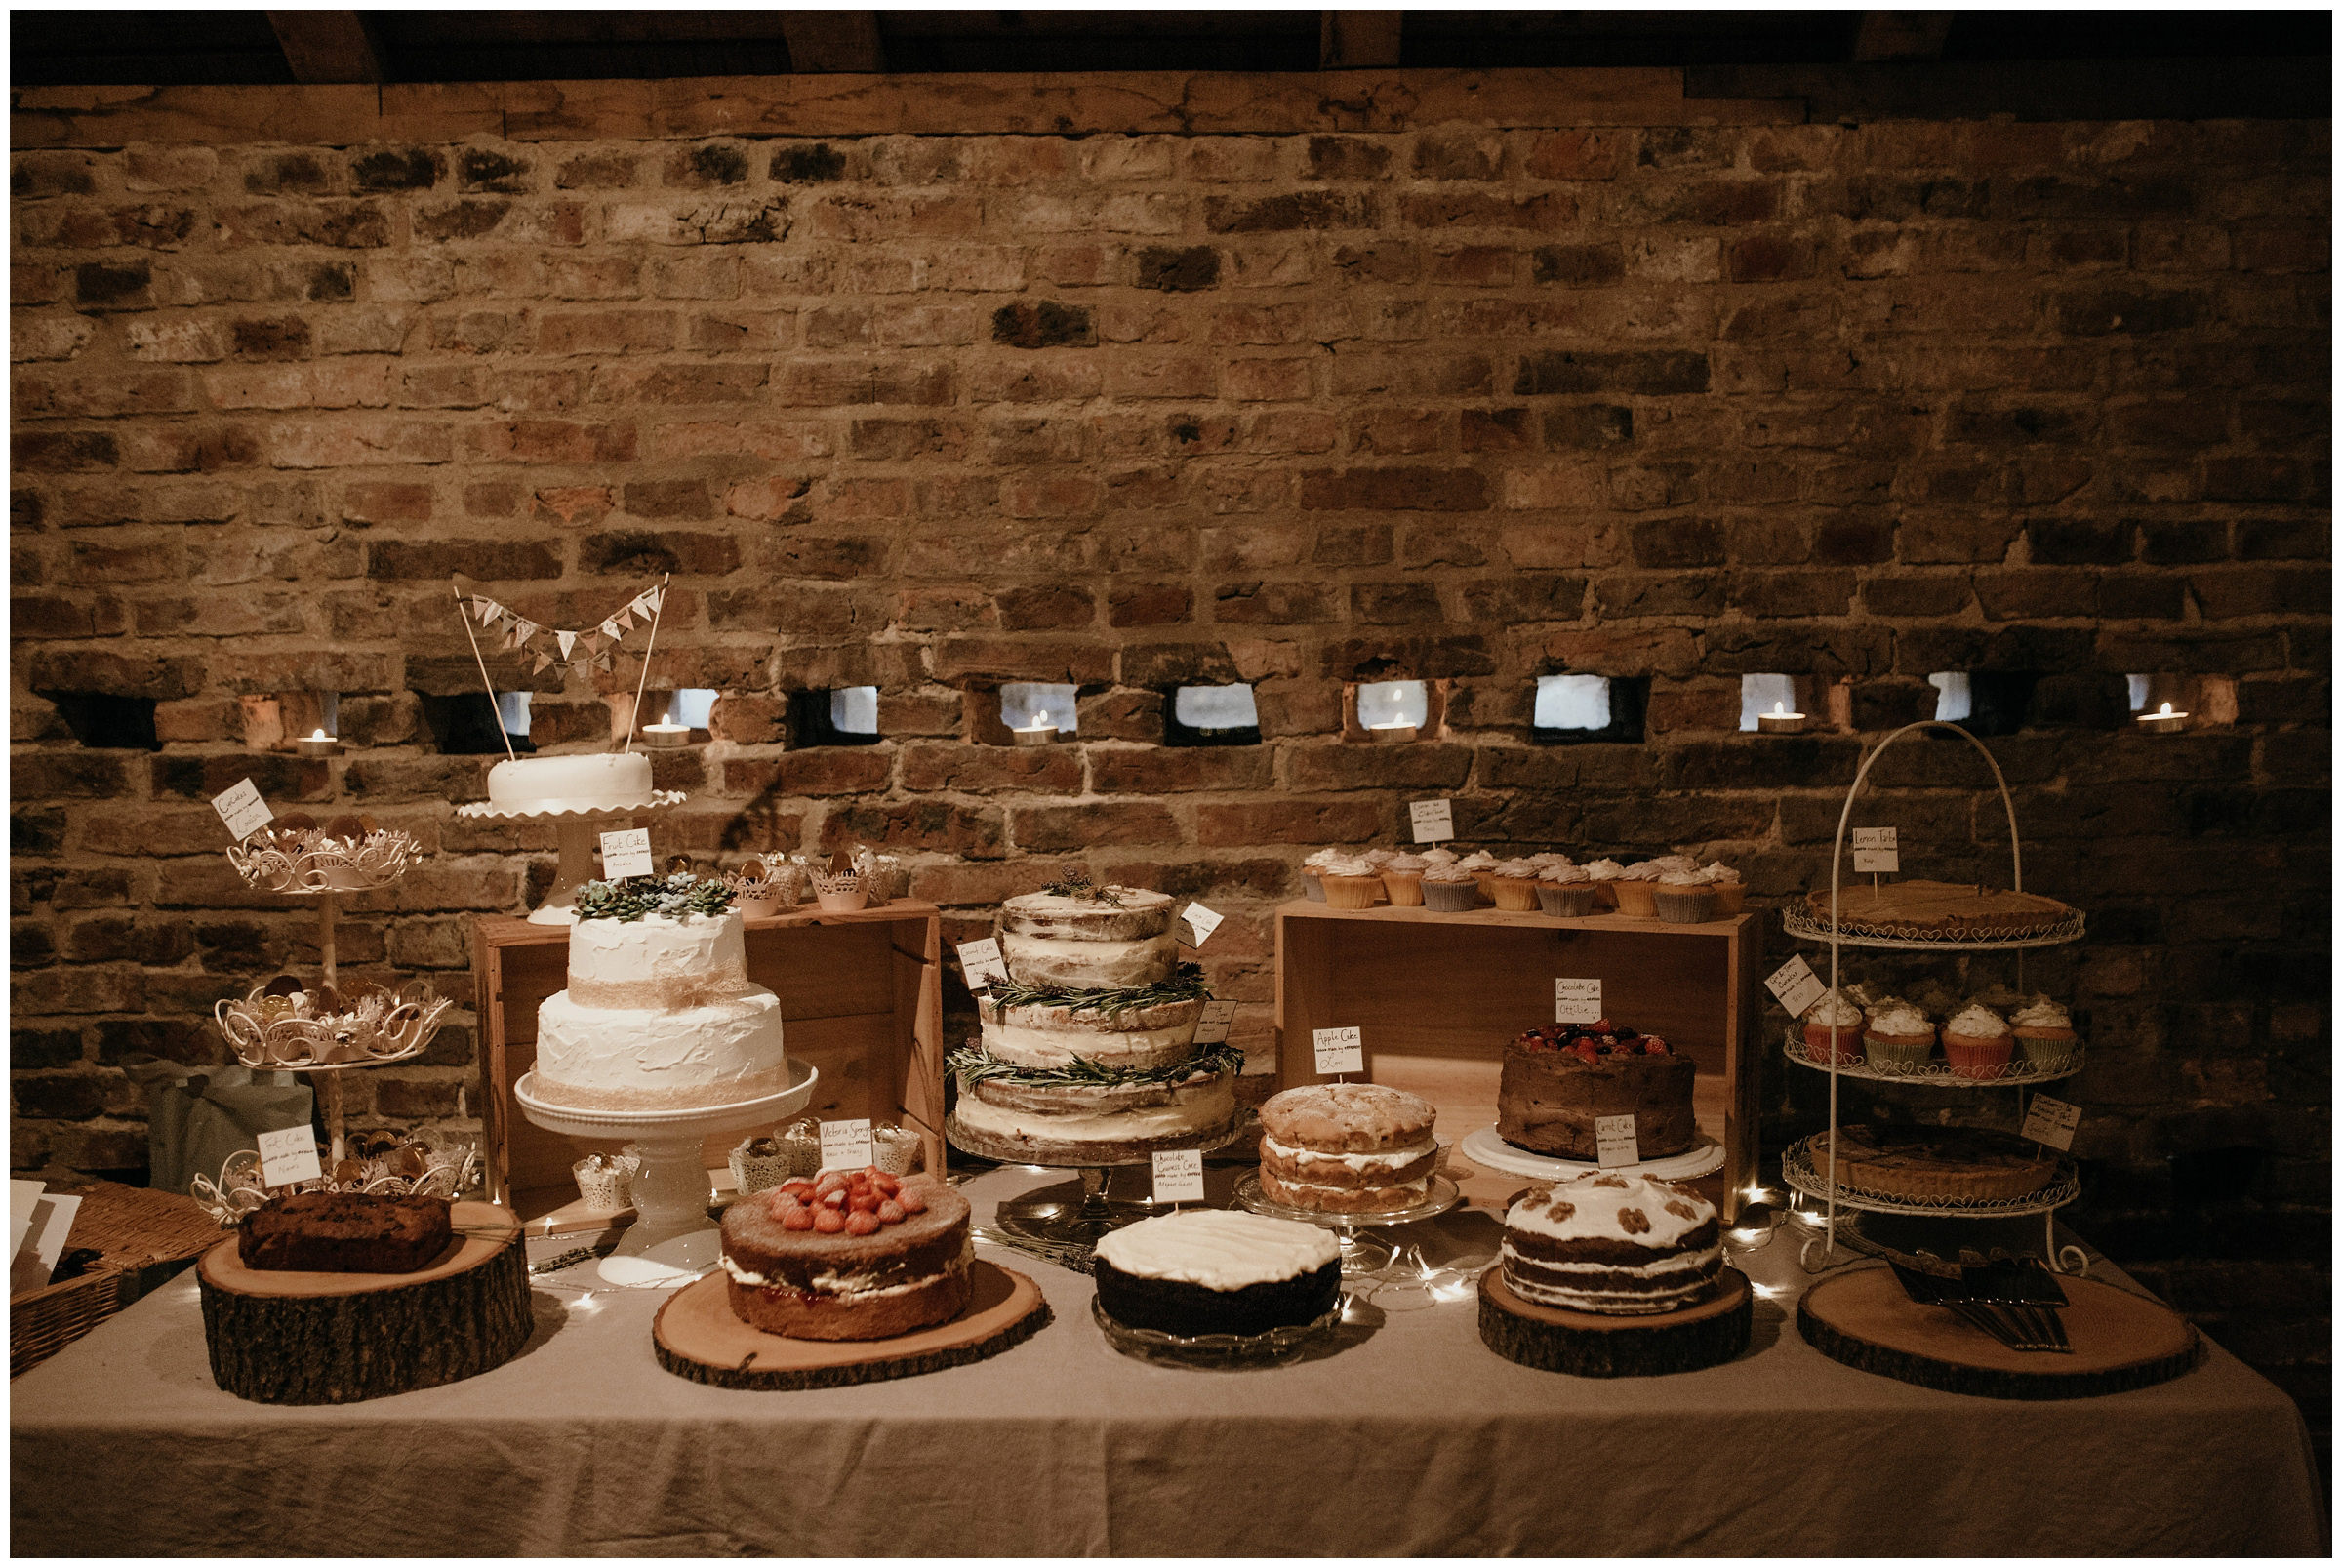 cakes at poppleton tithe barn